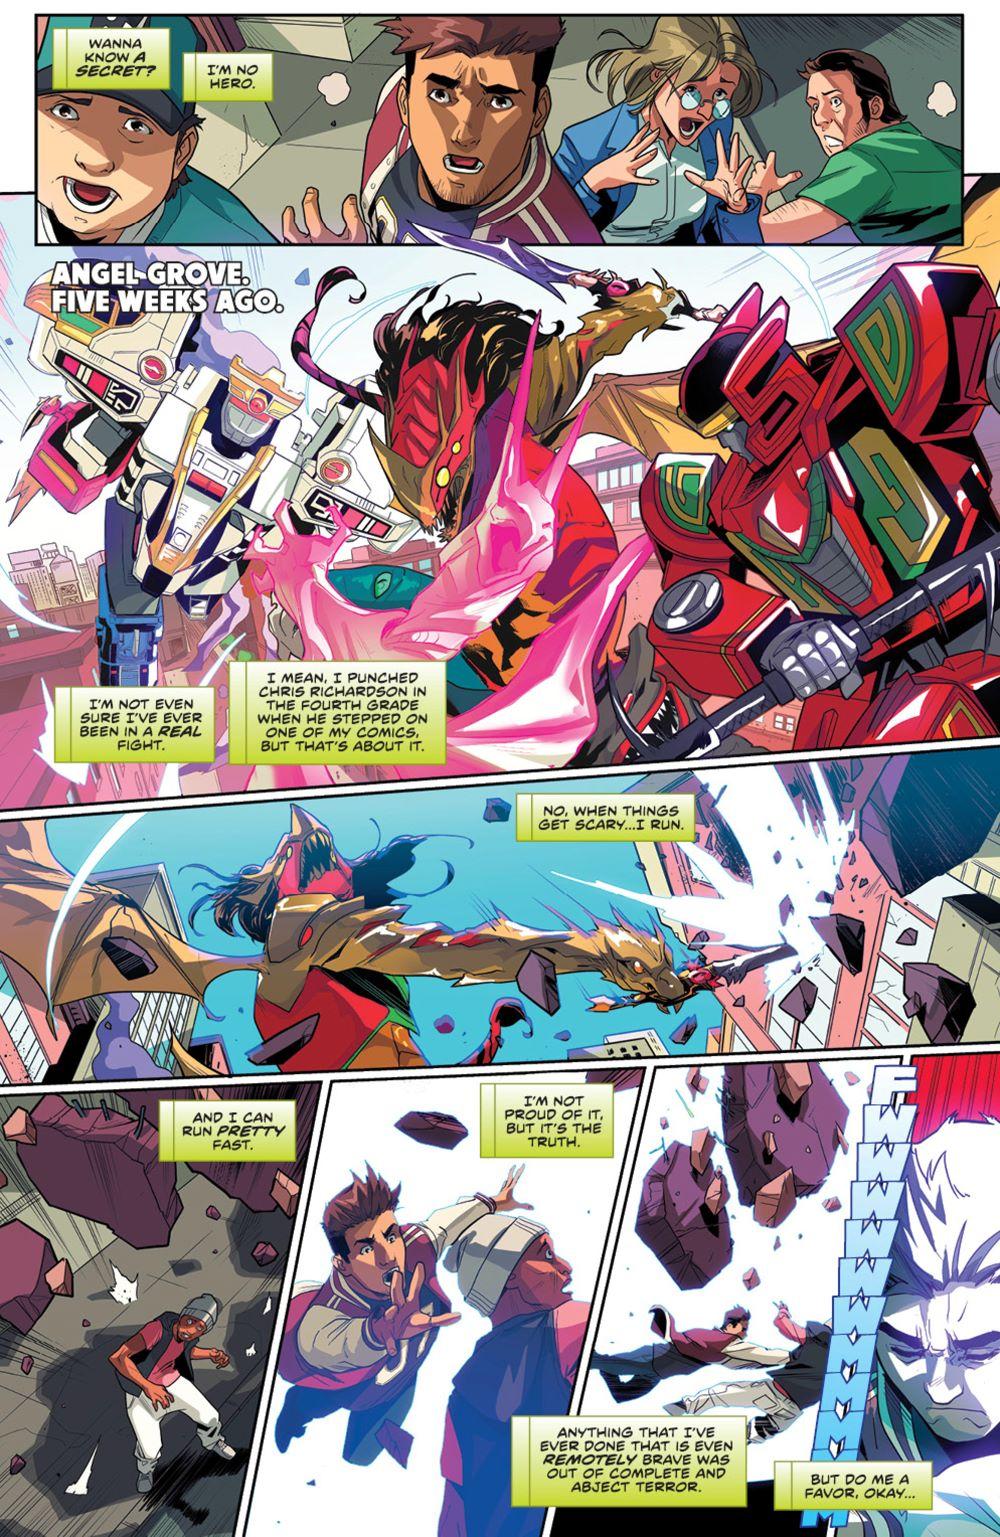 MightyMorphin_005_PRESS_3 ComicList Previews: MIGHTY MORPHIN #5